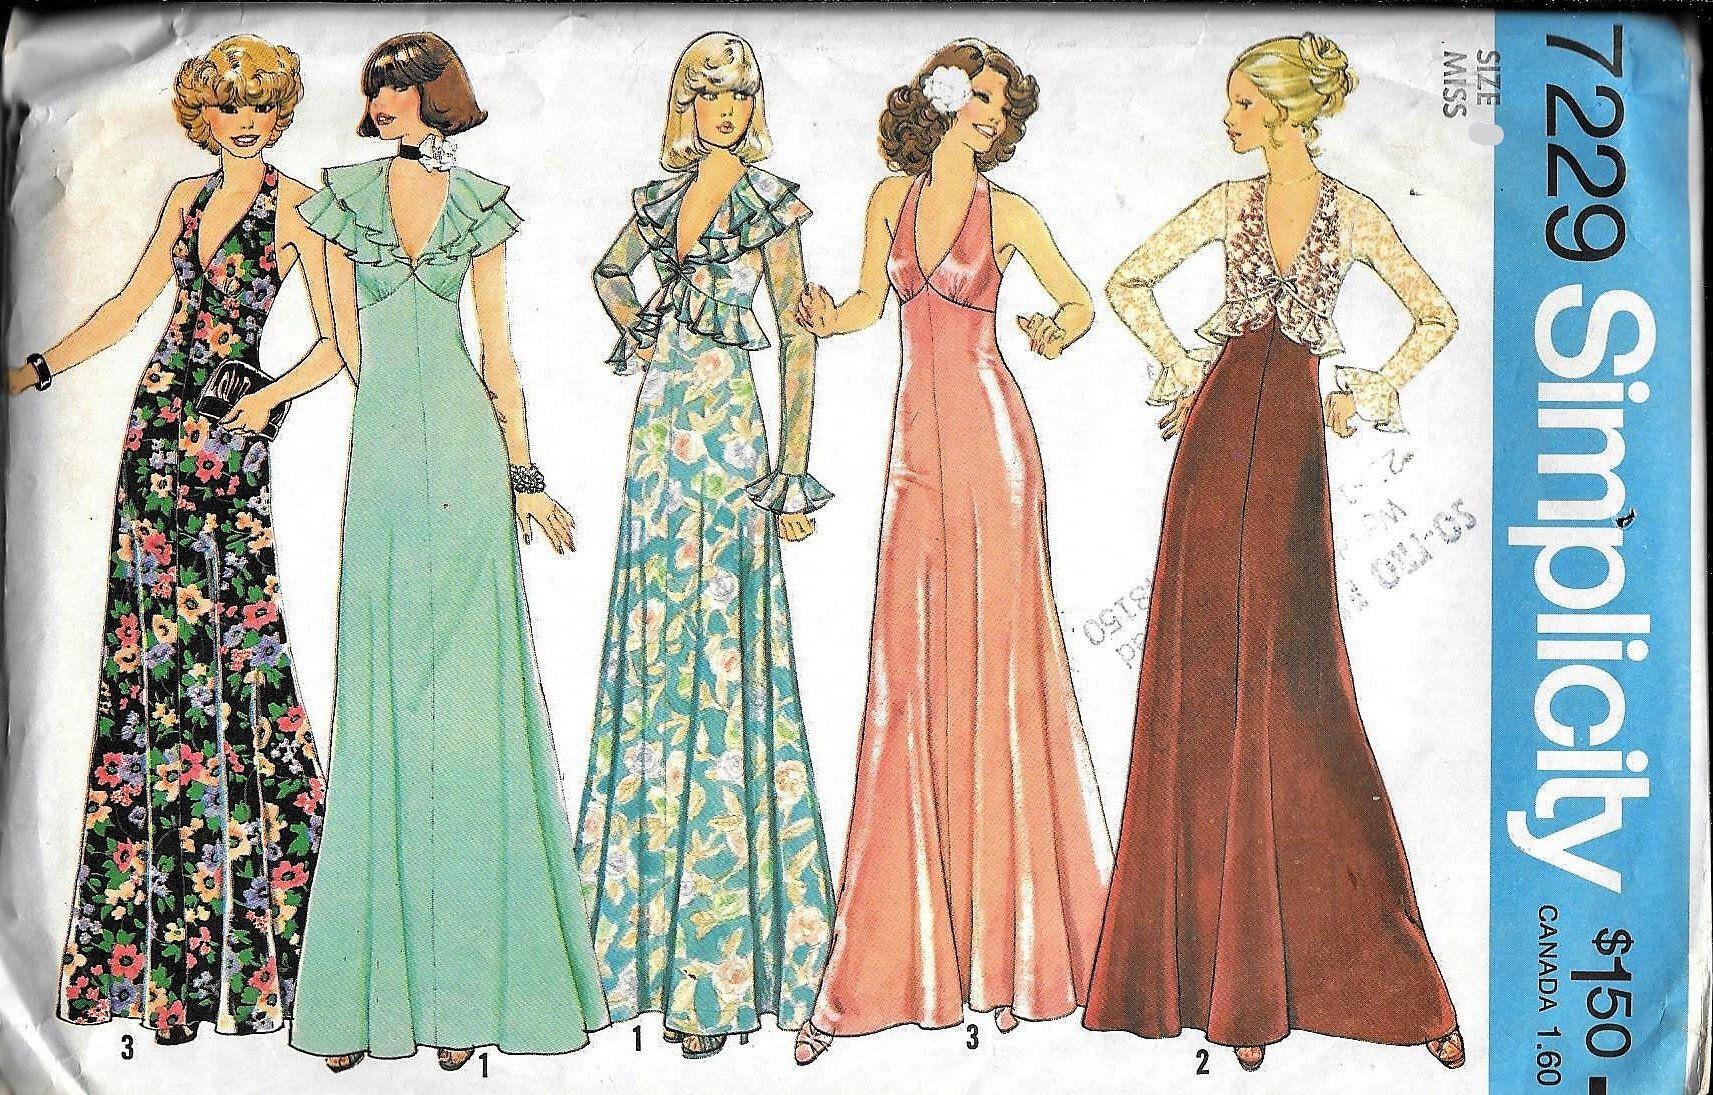 Vintage 1970 S Simplicity 7229 V Neck Halter Maxi Evening Dress Jacket Sewing Patte Prom Dress Sewing Patterns Simplicity Patterns Dresses Halter Dress Pattern [ 1095 x 1713 Pixel ]